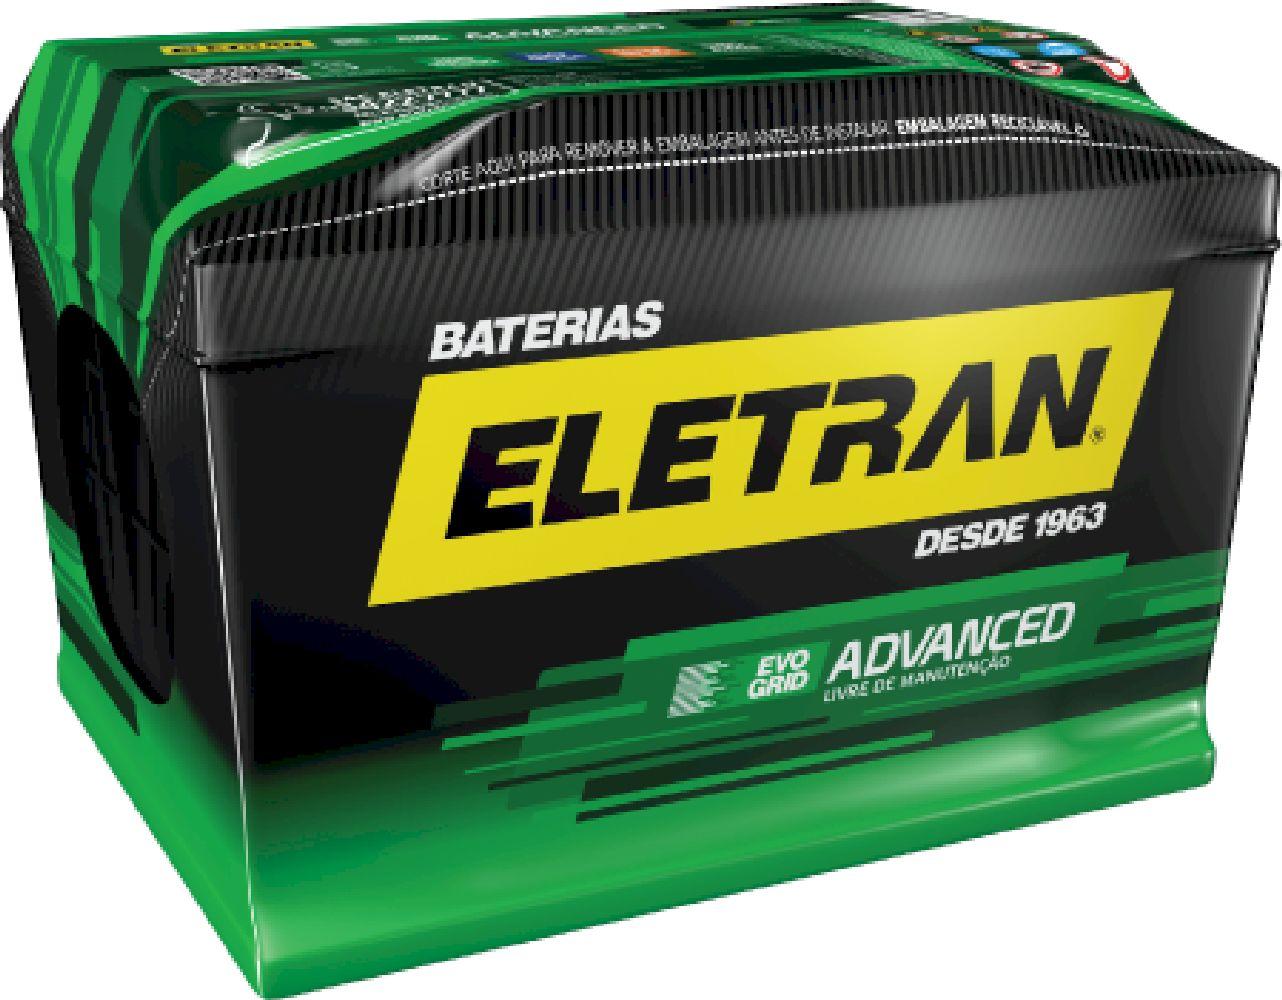 Bateria Automotiva Eletran Advanced - 60 PD